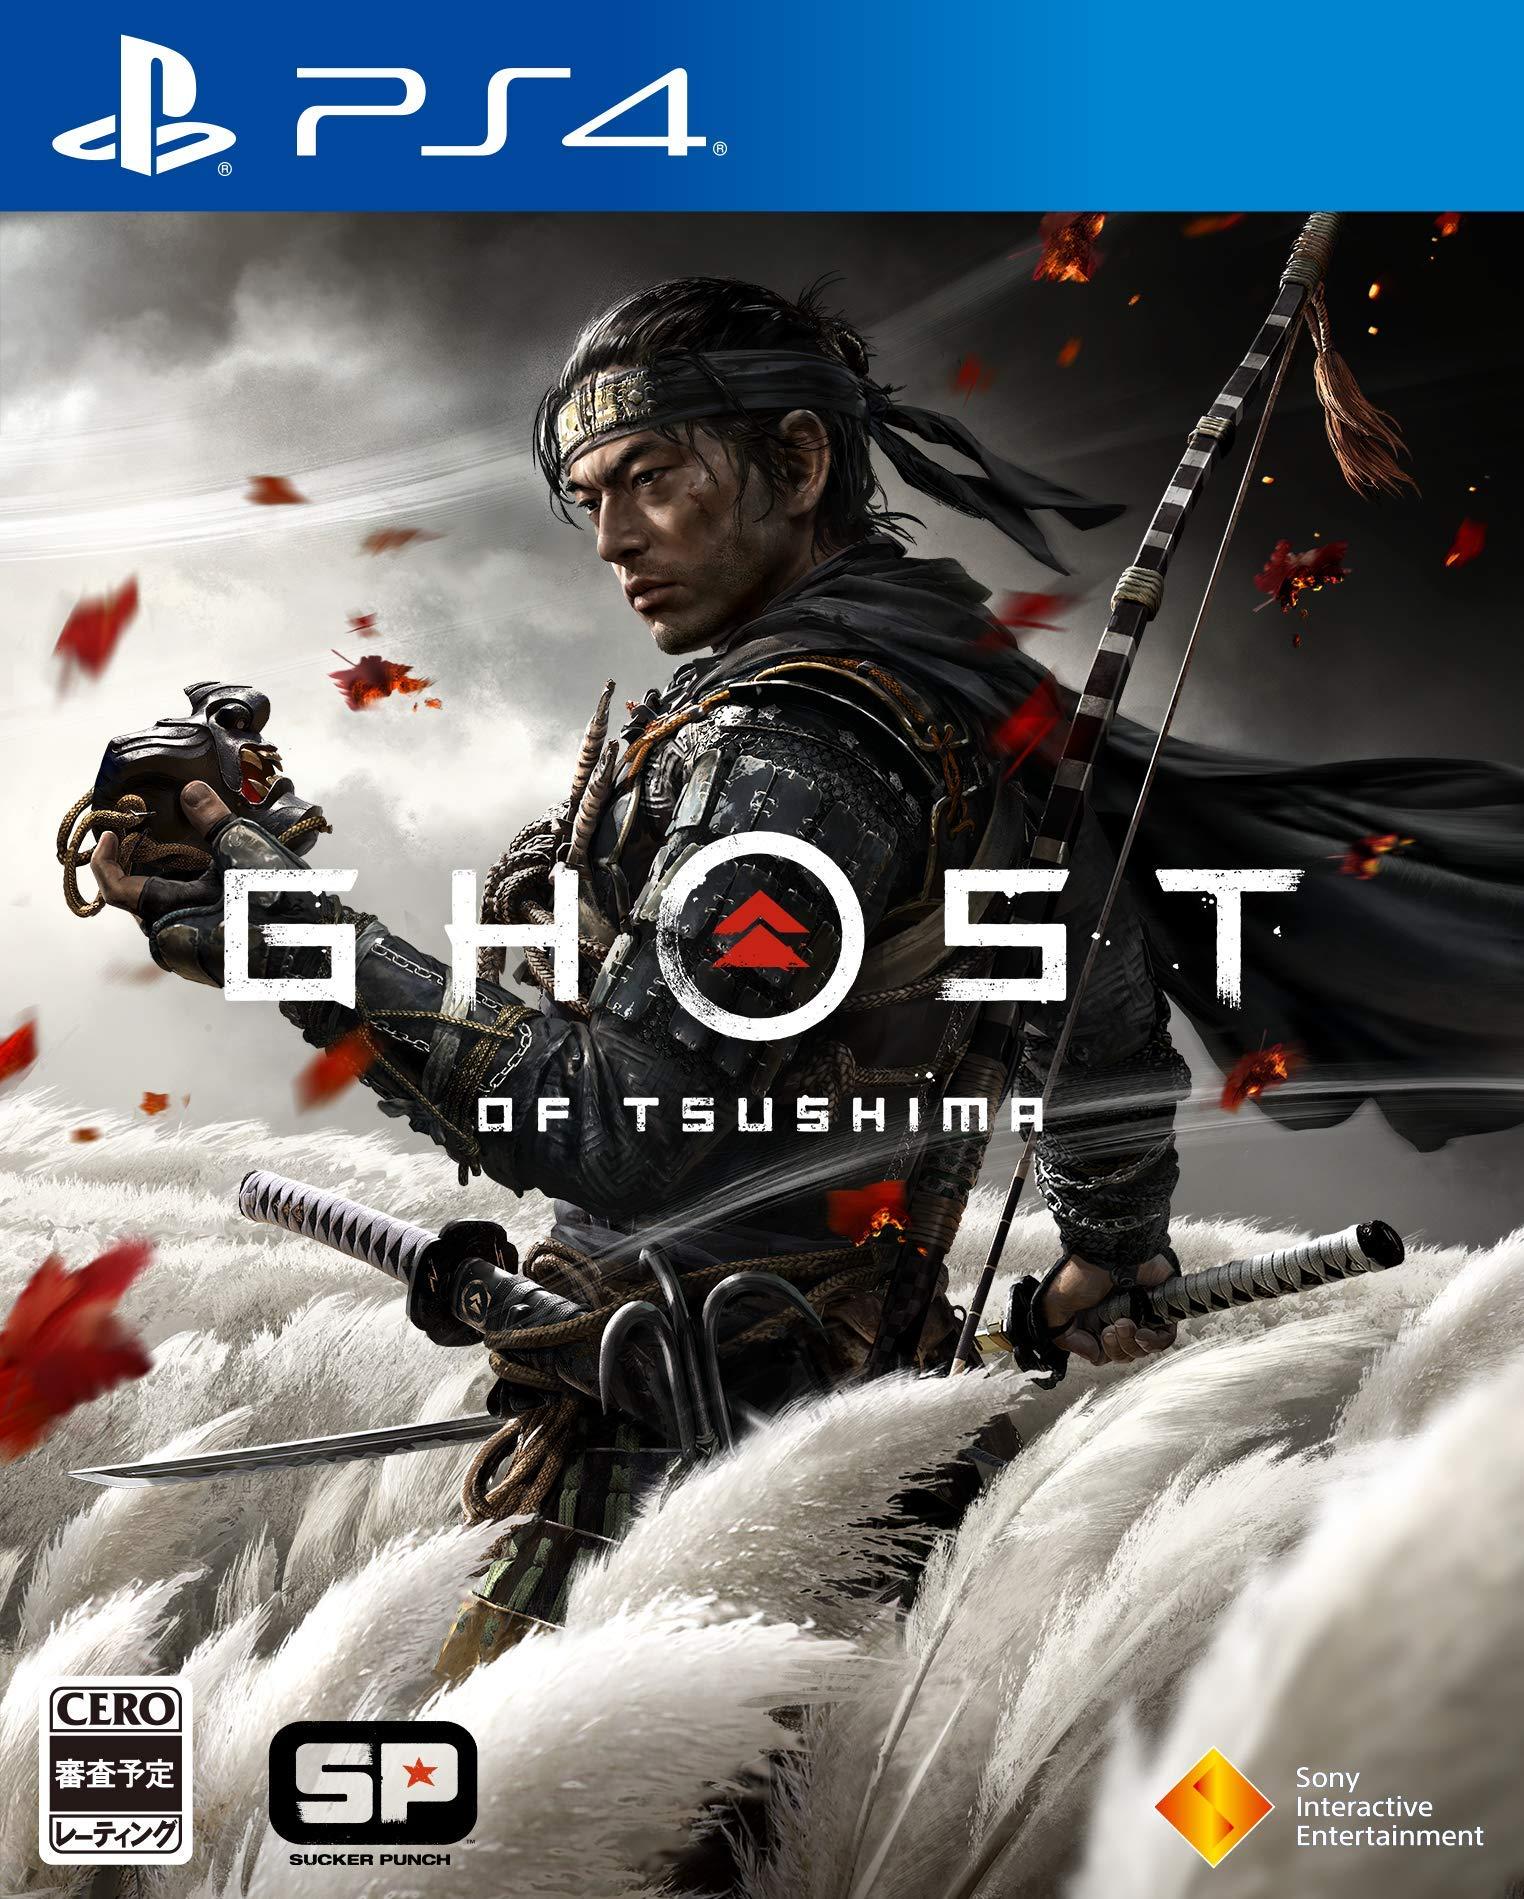 【PS4】『Ghost of Tsushima』早期購入特典・店舗特典【6月26日発売!】